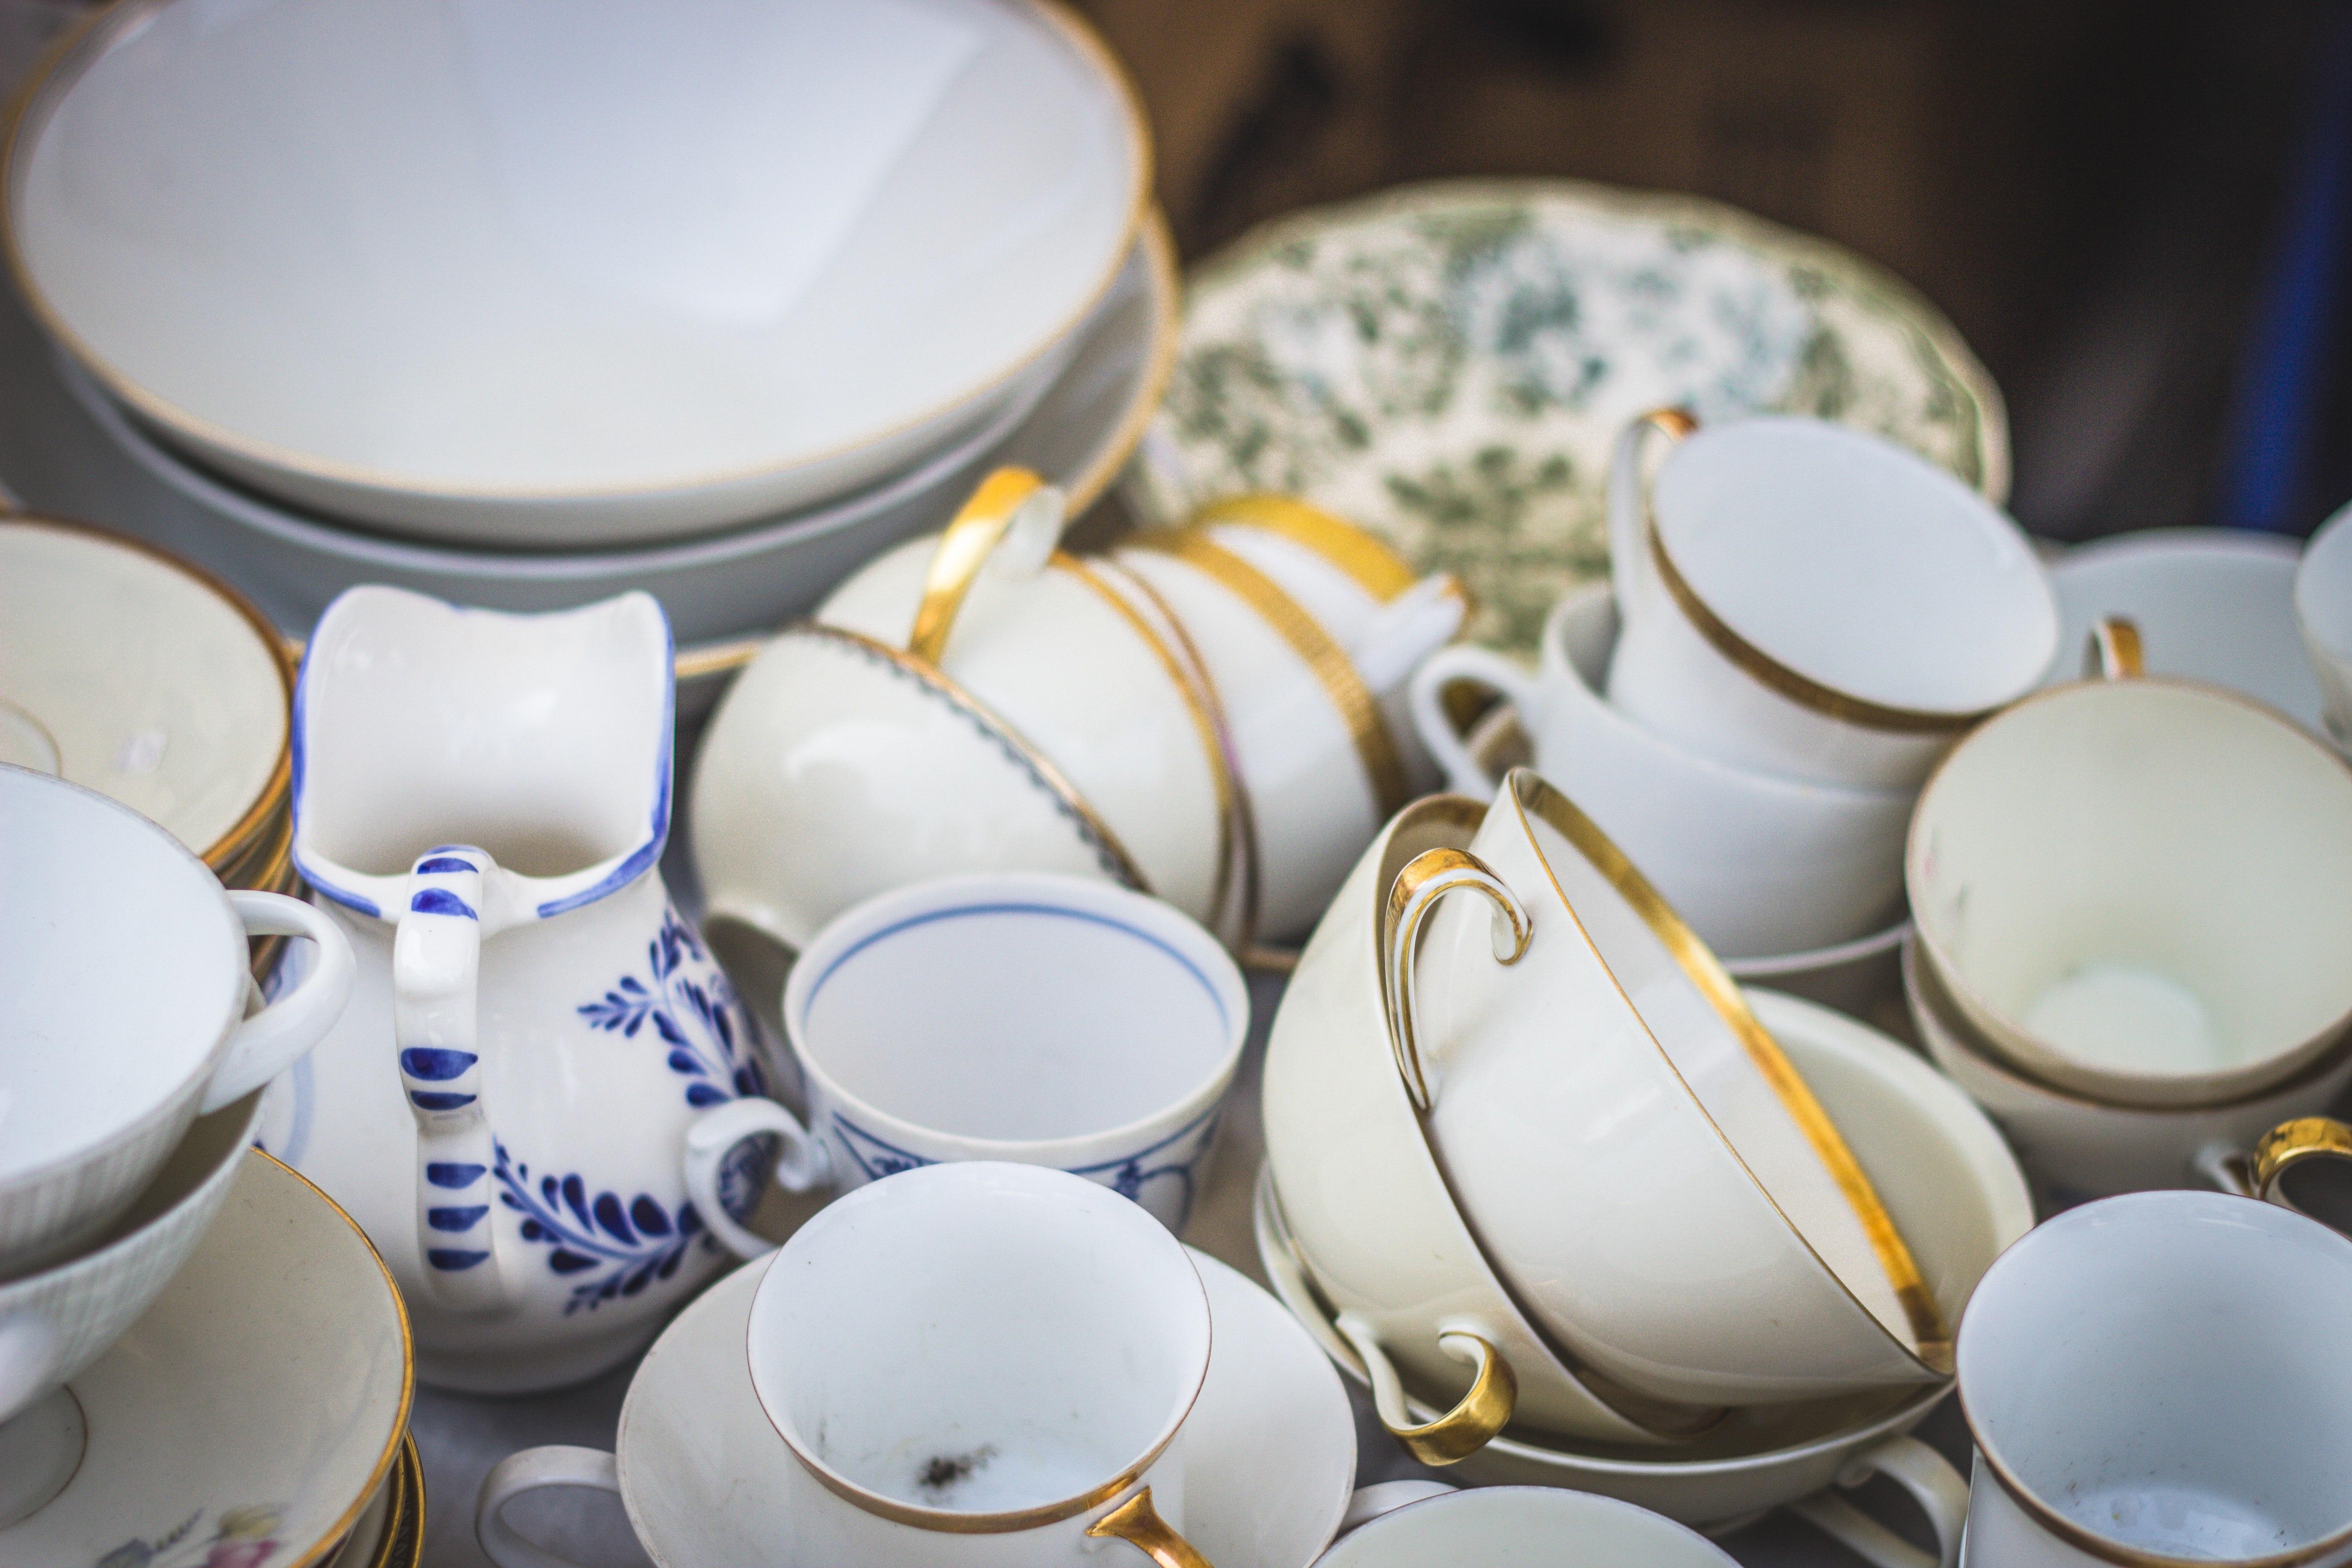 Polska ceramika i porcelana z lat 50. i 60.